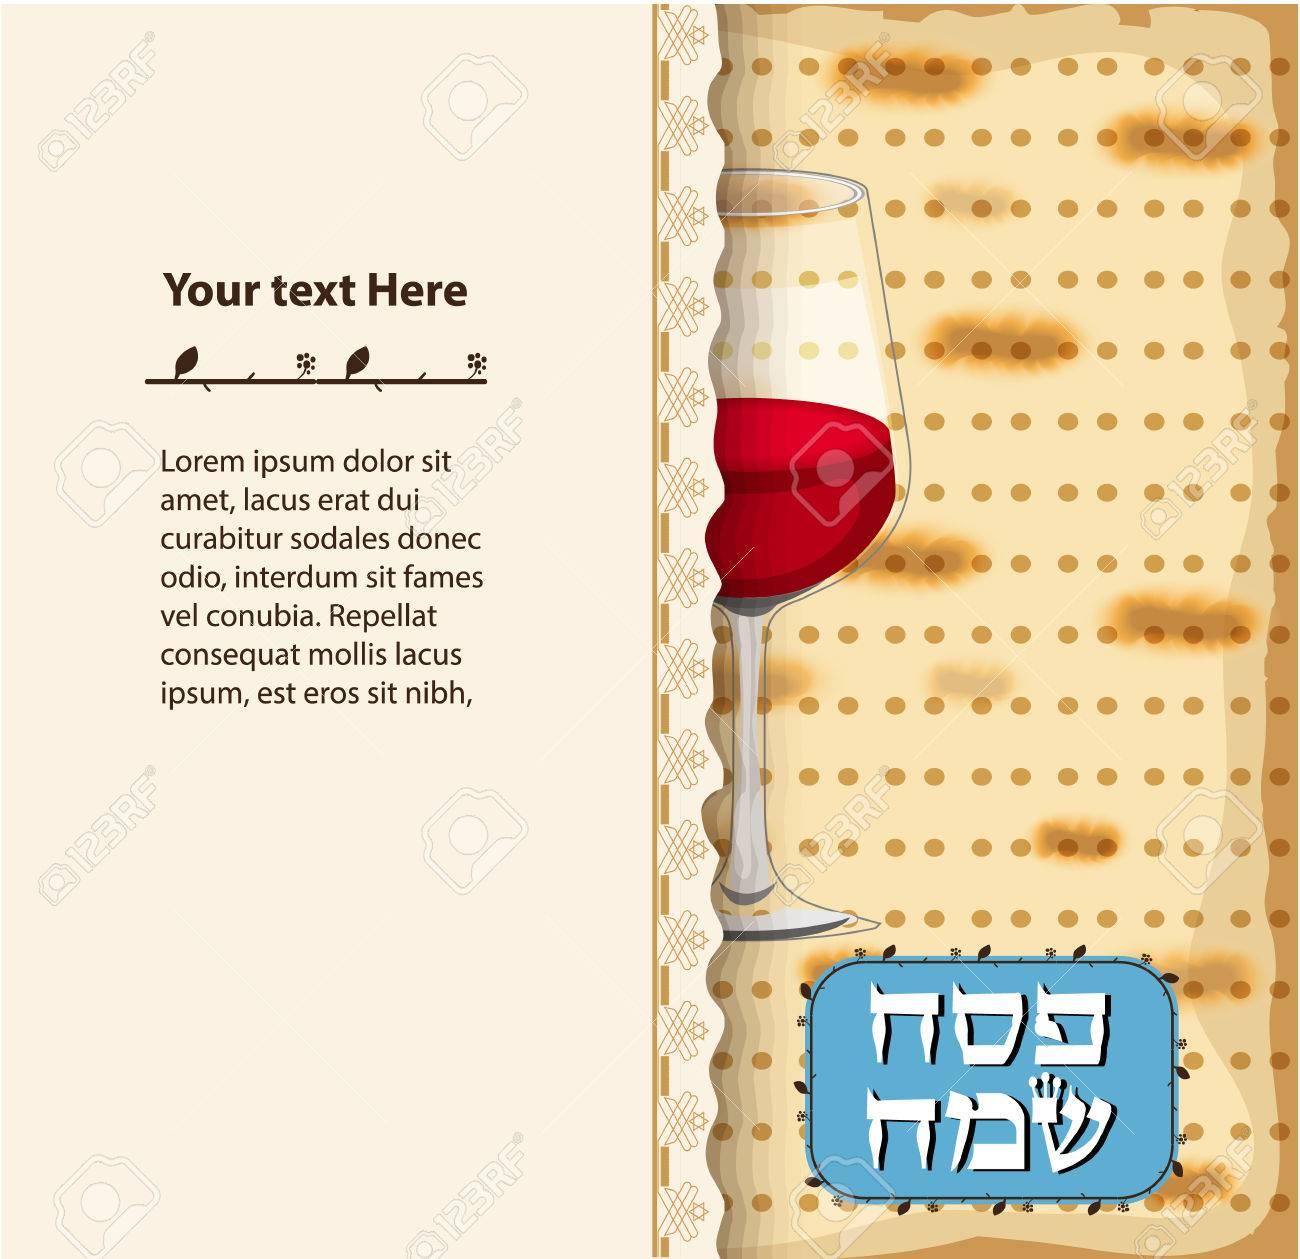 Funny happy jewish passover greeting card vector illustration funny happy jewish passover greeting card vector illustration eps 10 stock vector 55594292 m4hsunfo